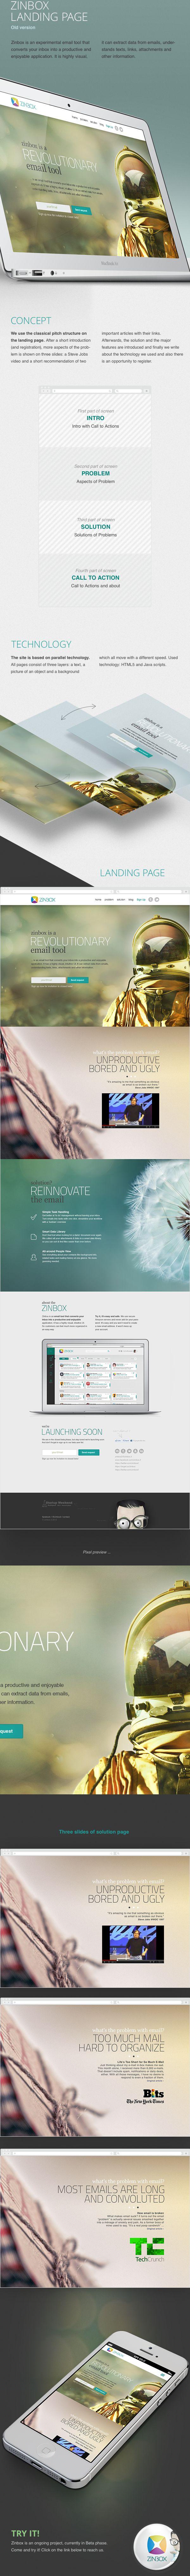 Zinbox landing page v1.1 by Vincze Istvan, via Behance